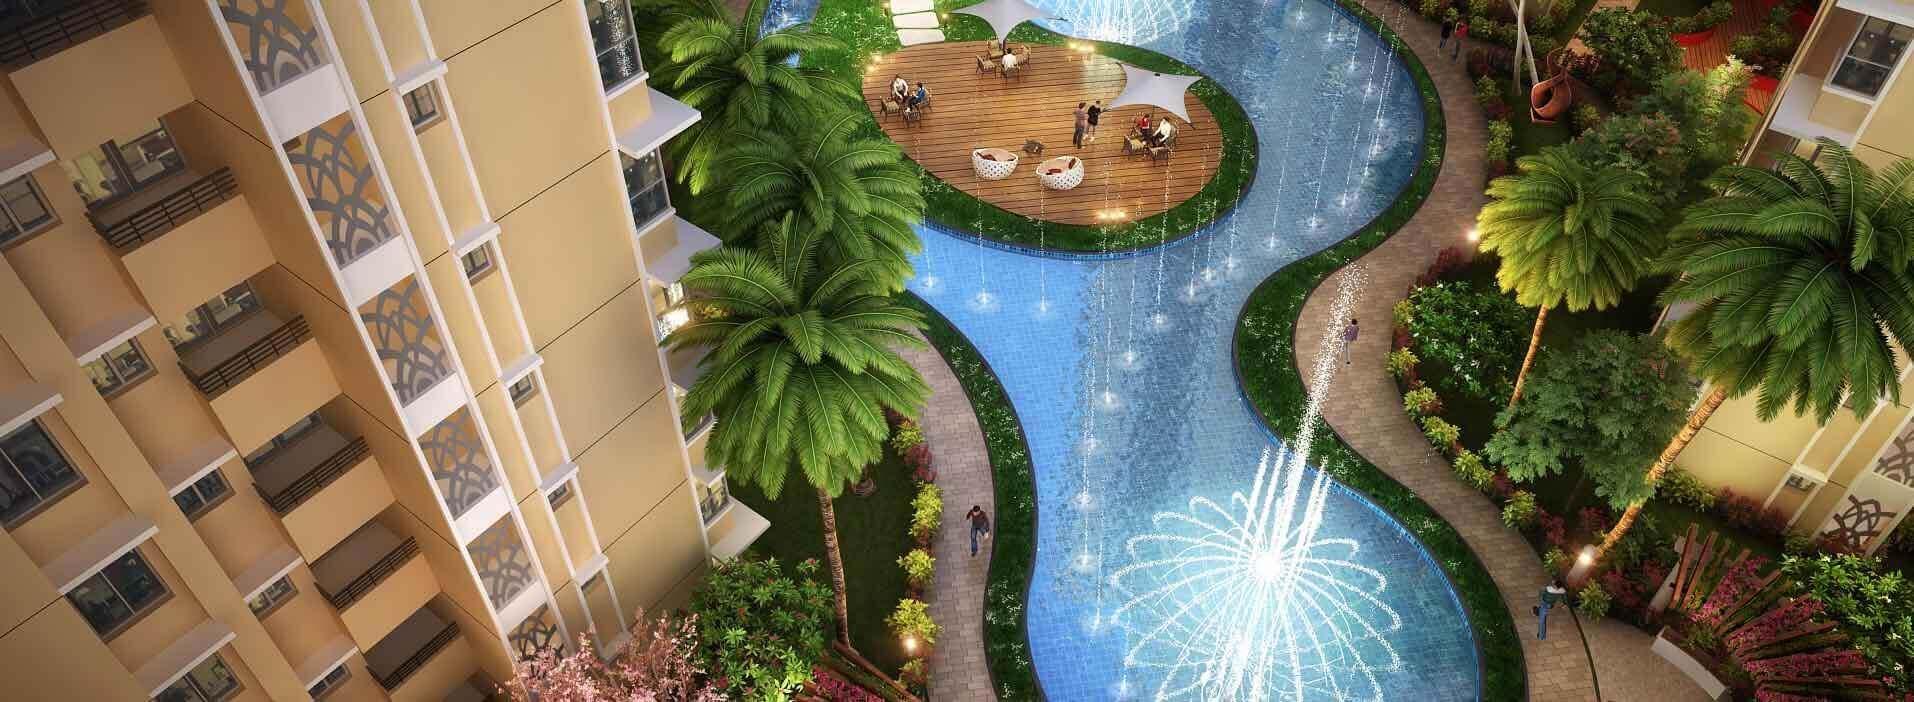 alcove new kolkata amenities features6